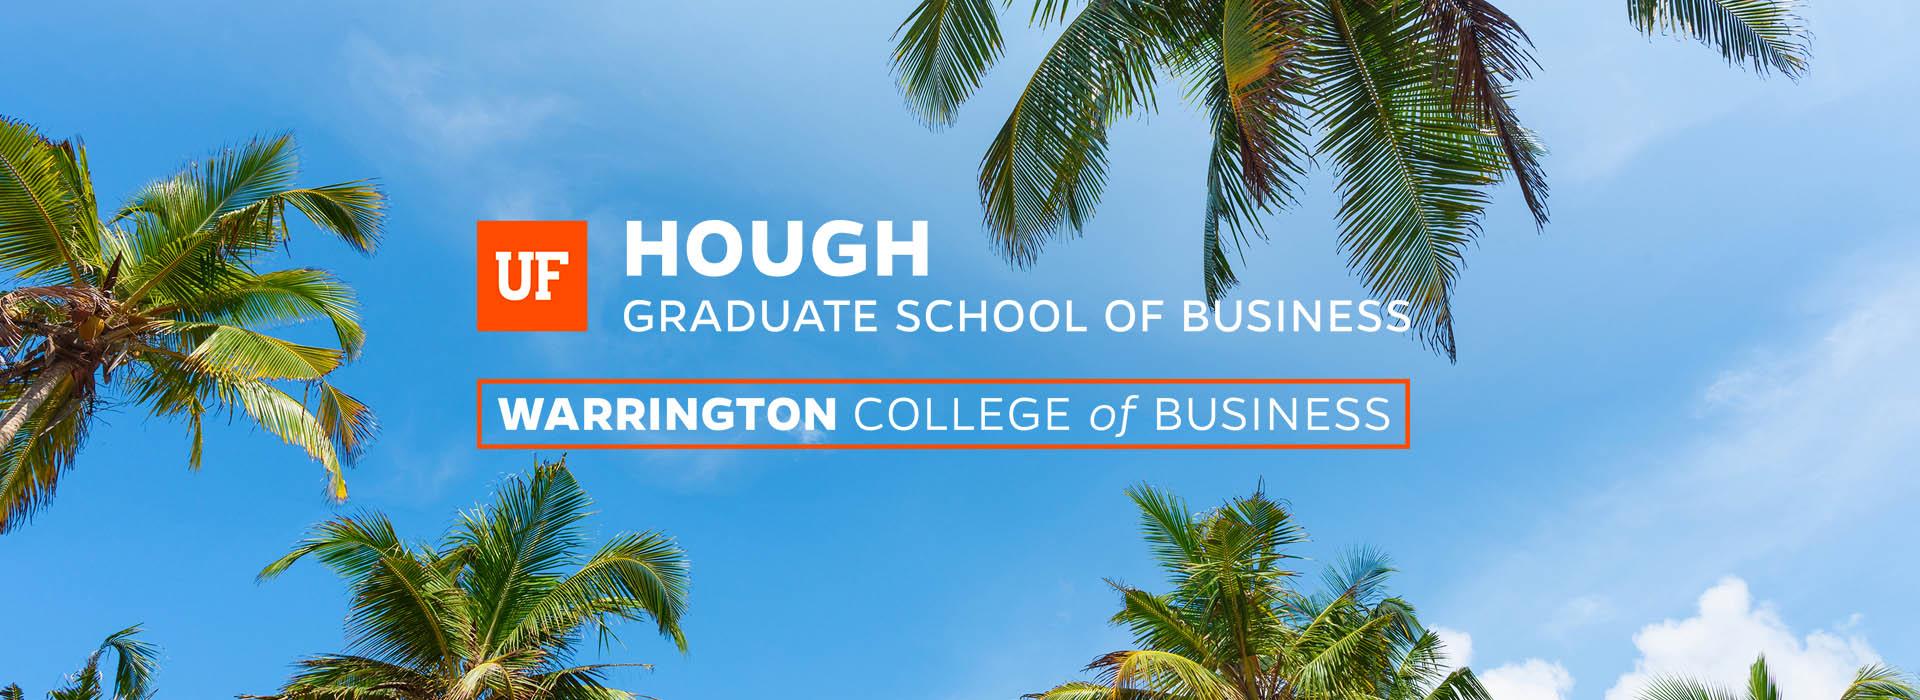 UF Hough Graduate School of Business   Warrington College of Business